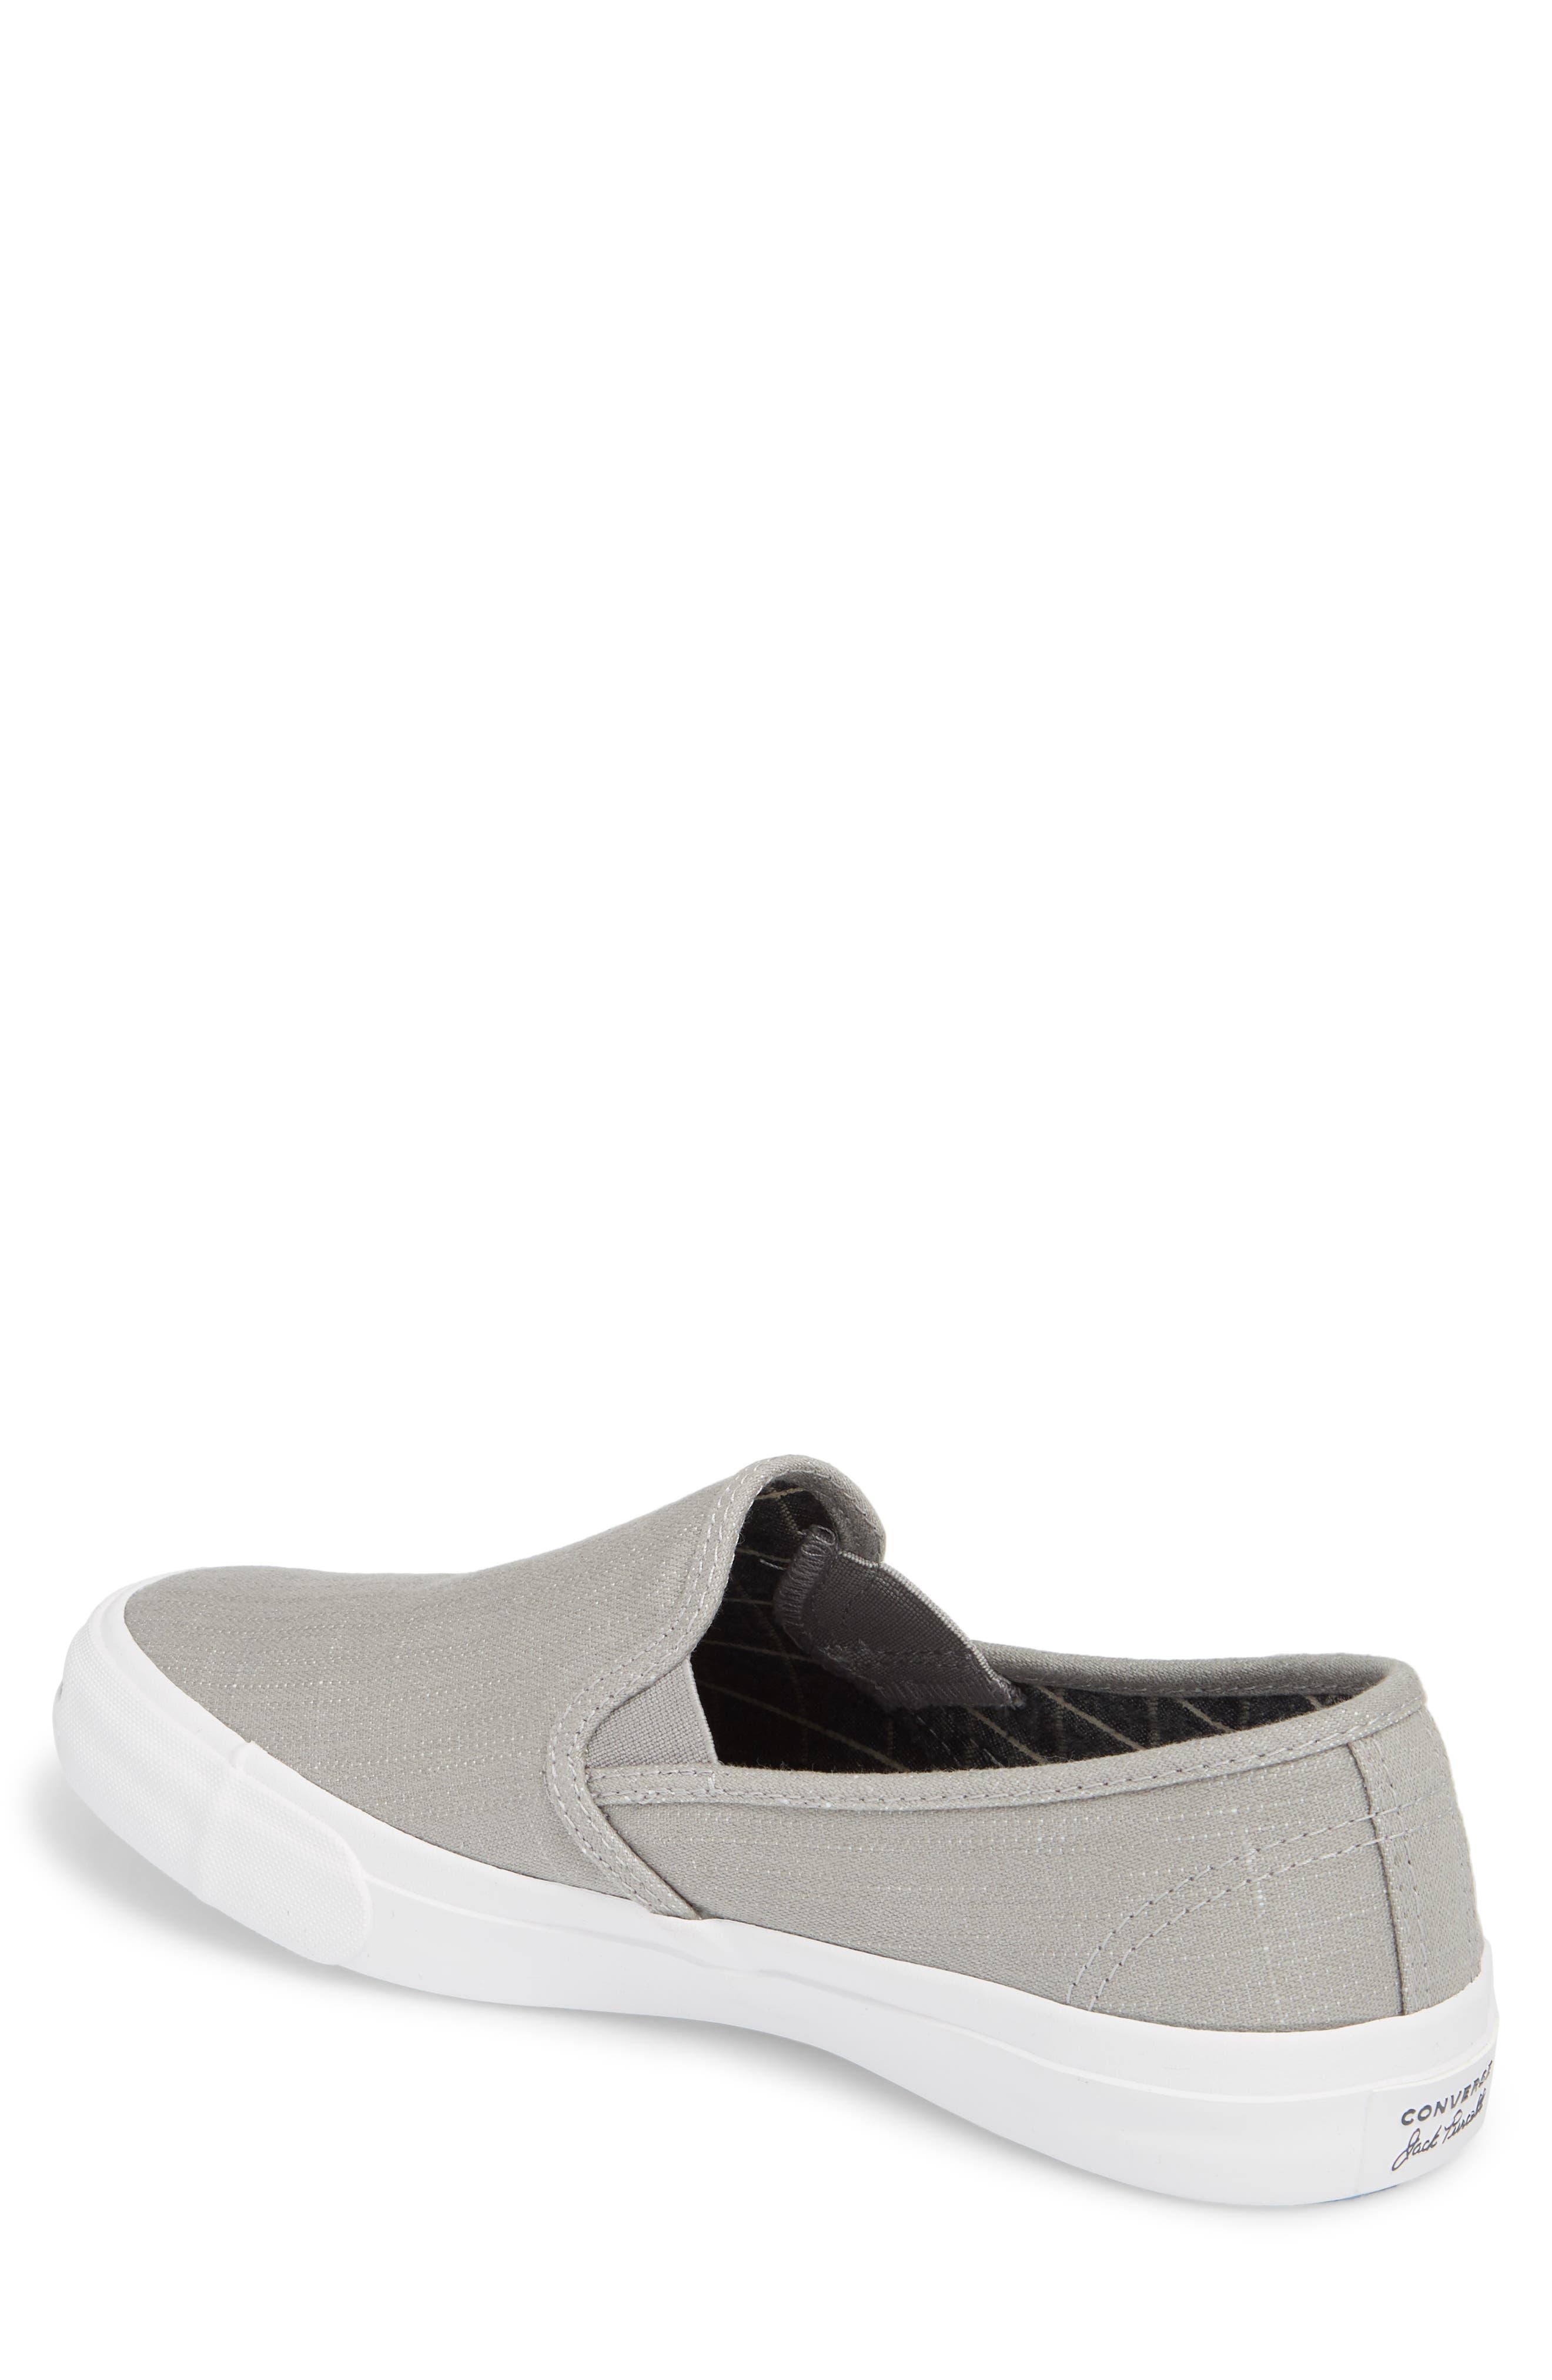 Jack Purcell Low Profile Slip-On Sneaker,                             Alternate thumbnail 2, color,                             020